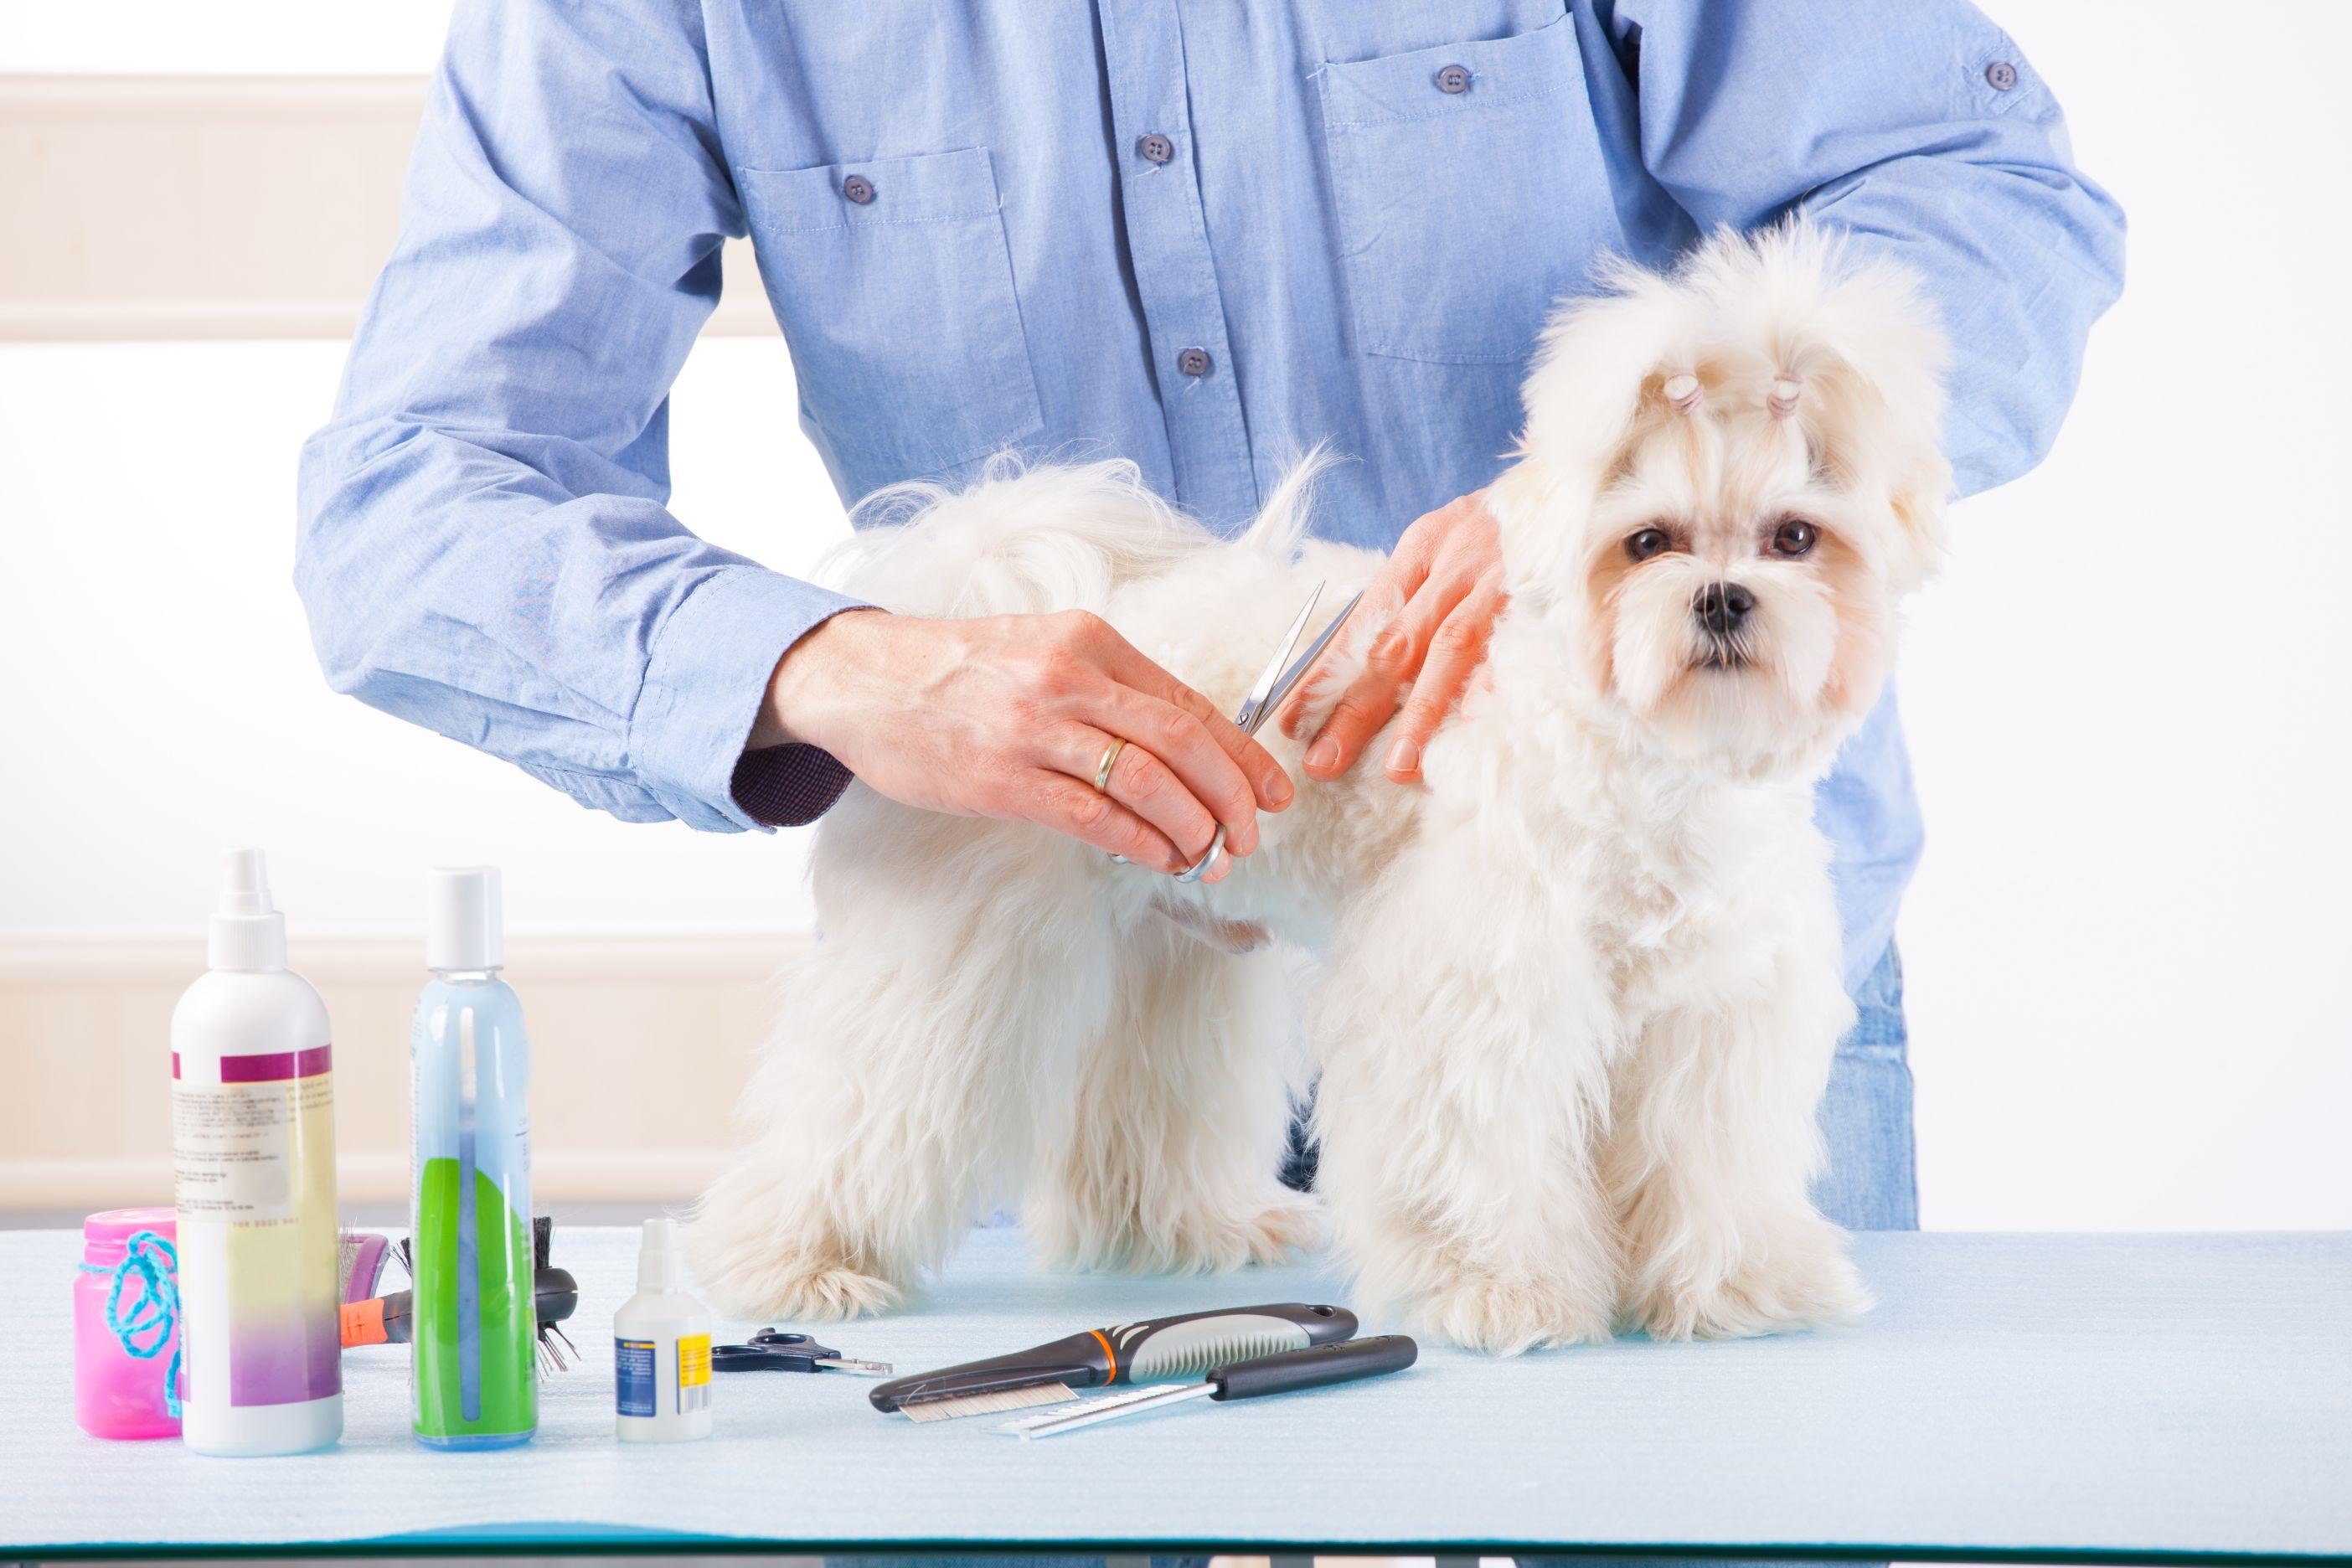 animal-grooming